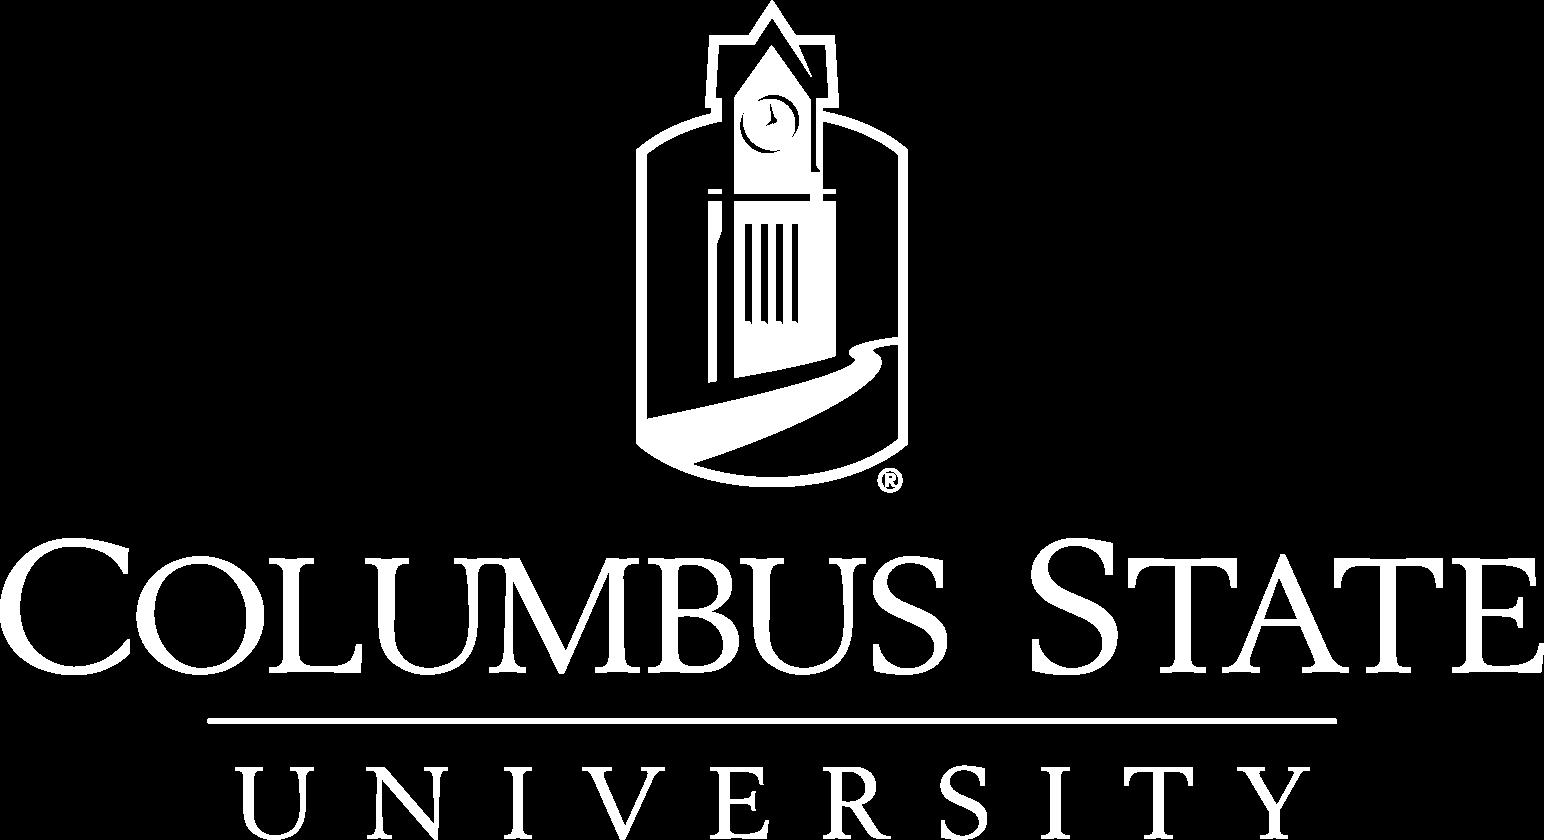 Visit the website of Columbus State University